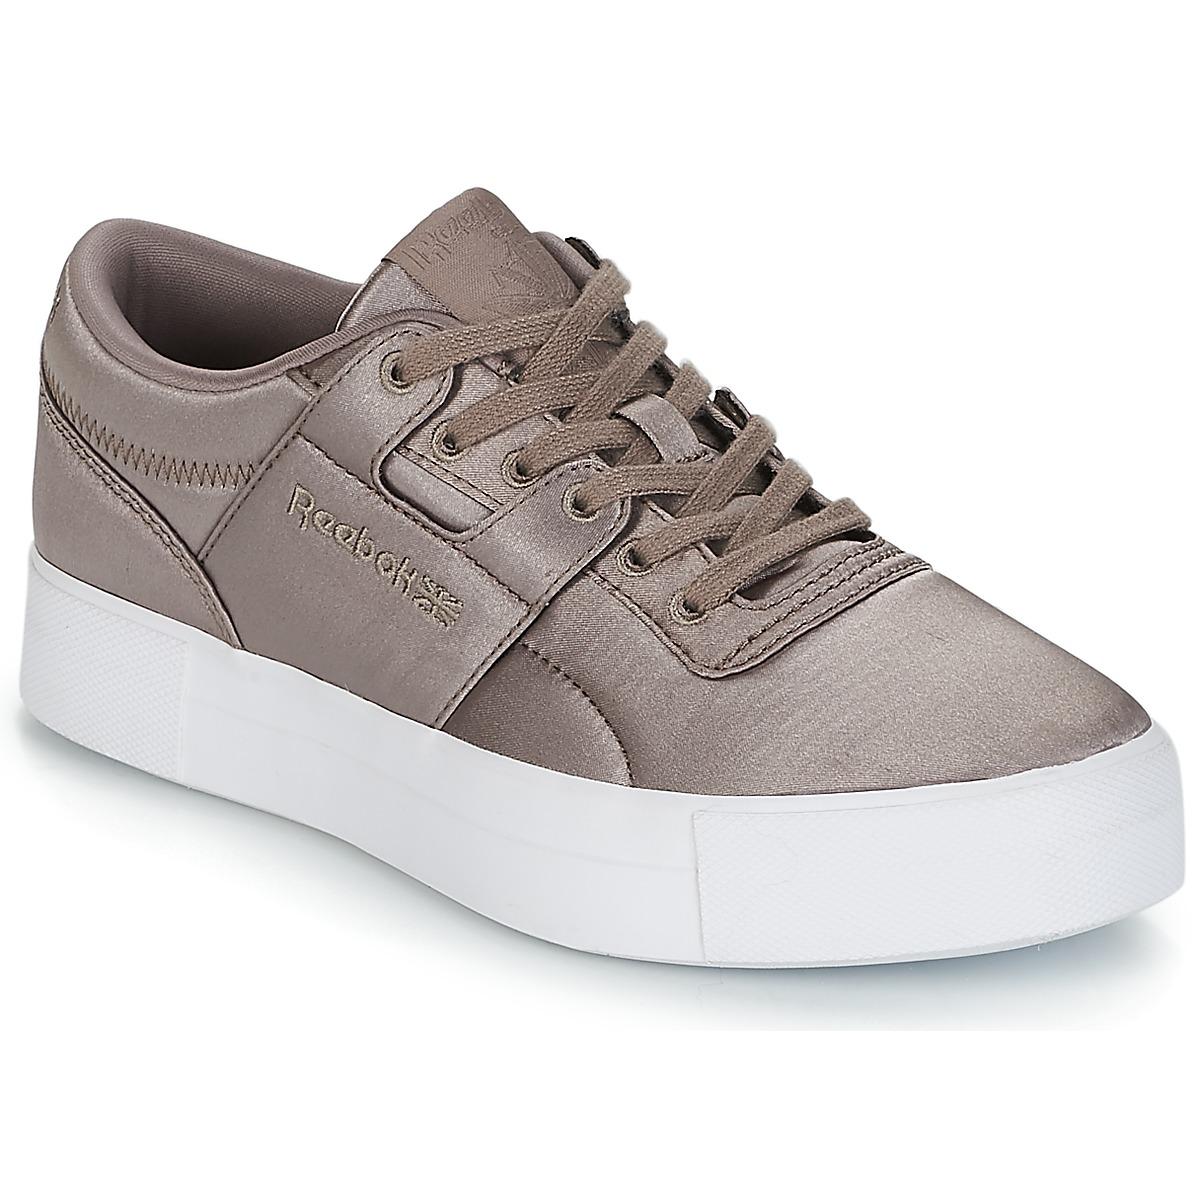 Reebok Classic WORKOUT LO FVS TXT Grau - Kostenloser Versand bei Spartoode ! - Schuhe Sneaker Low Damen 99,95 €